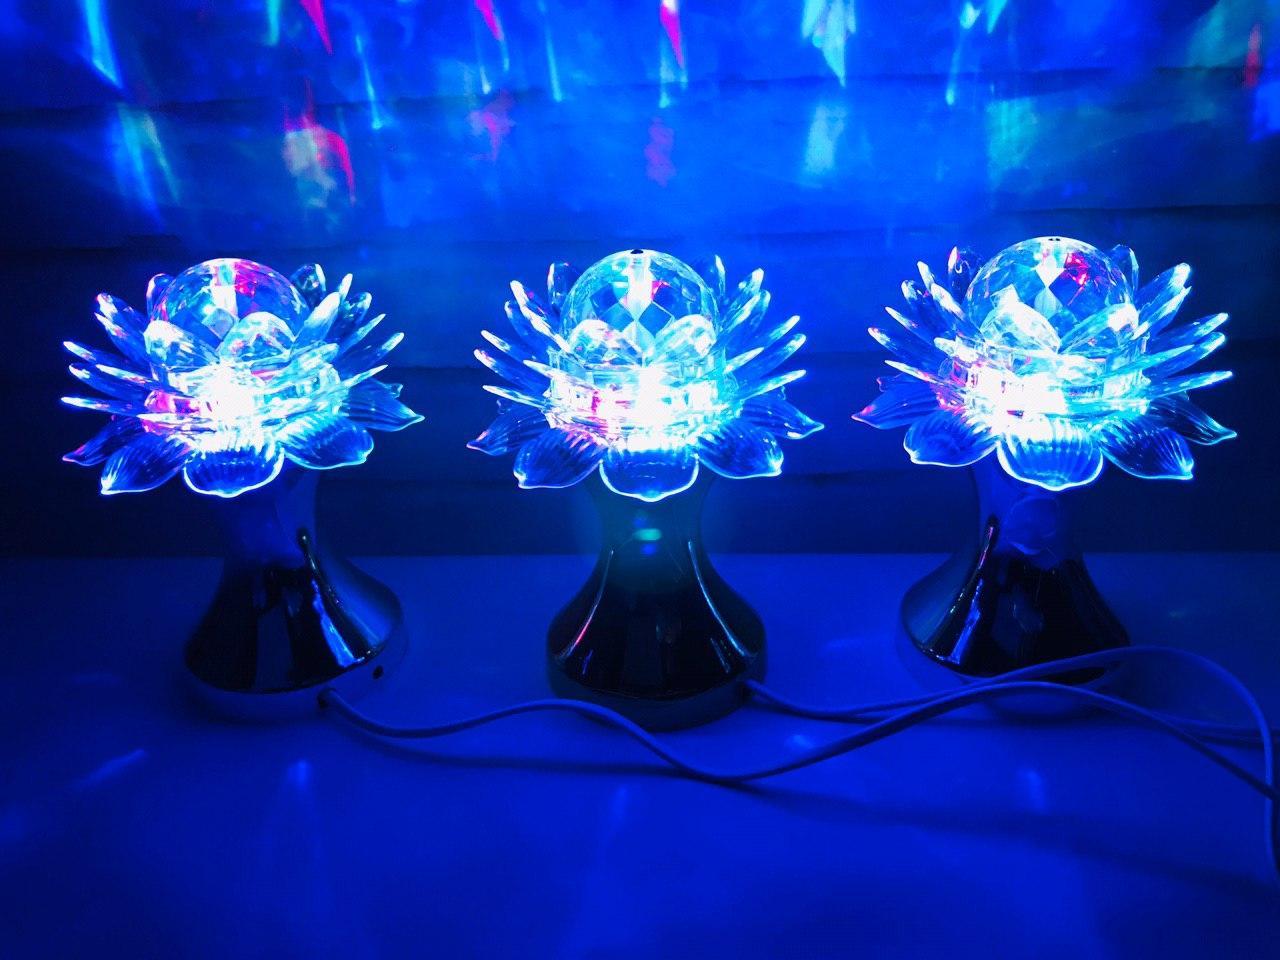 Яркая, Вращающаяся диско лампа Led full color rotating lamp светодиодная Лилия DISCO CB 0319. Лучшая Цена! AVE